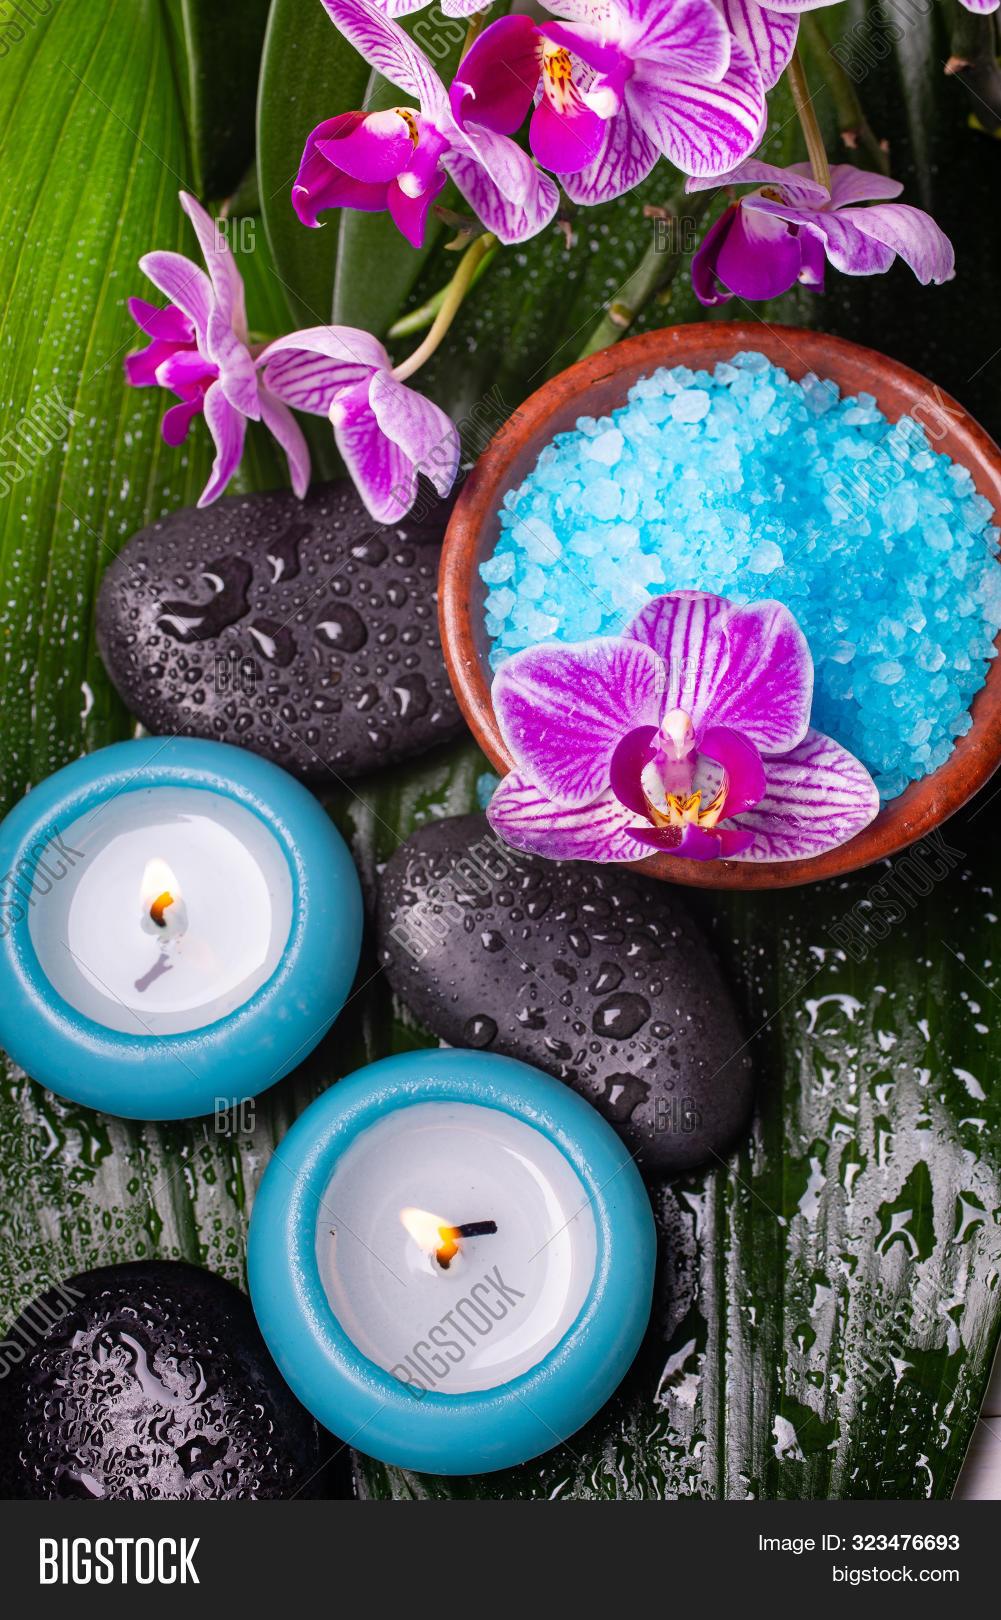 KESS InHouse Graphic Tabby Blue Beauty Teal Floral Yoga Mat 72 X 24